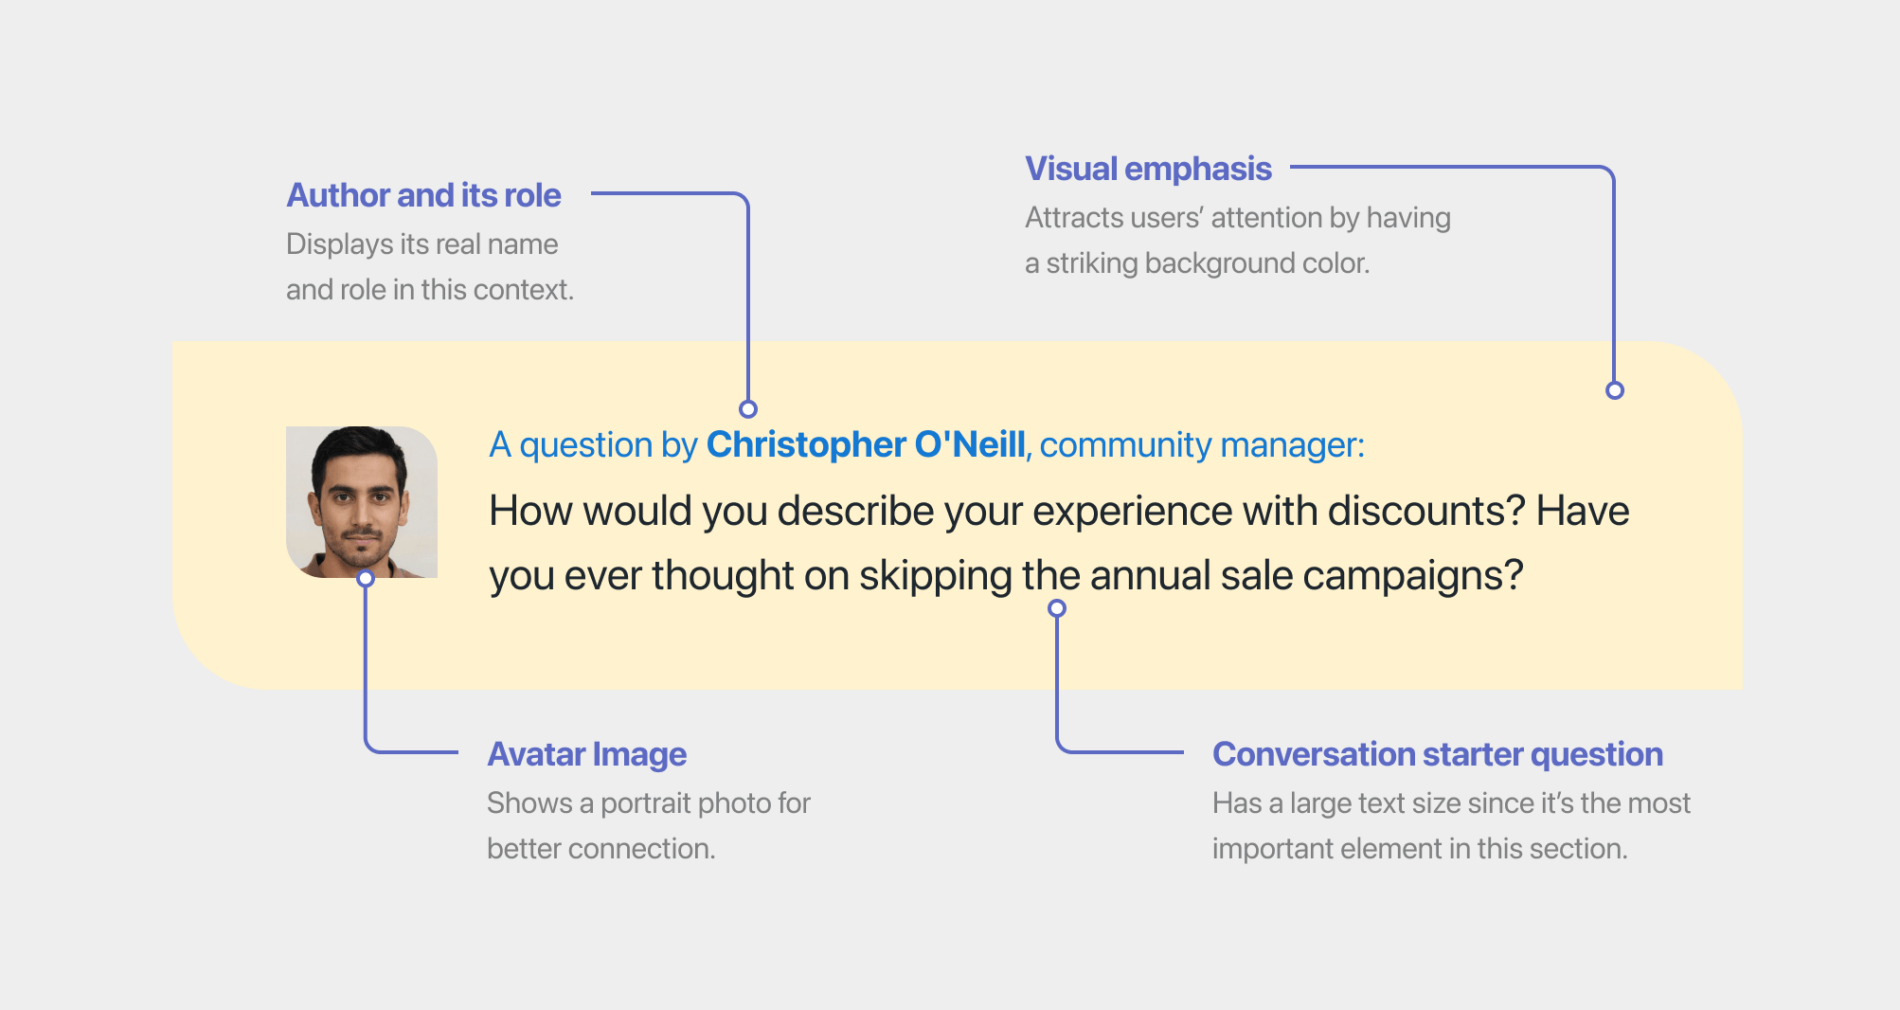 The conversation starter elements explained